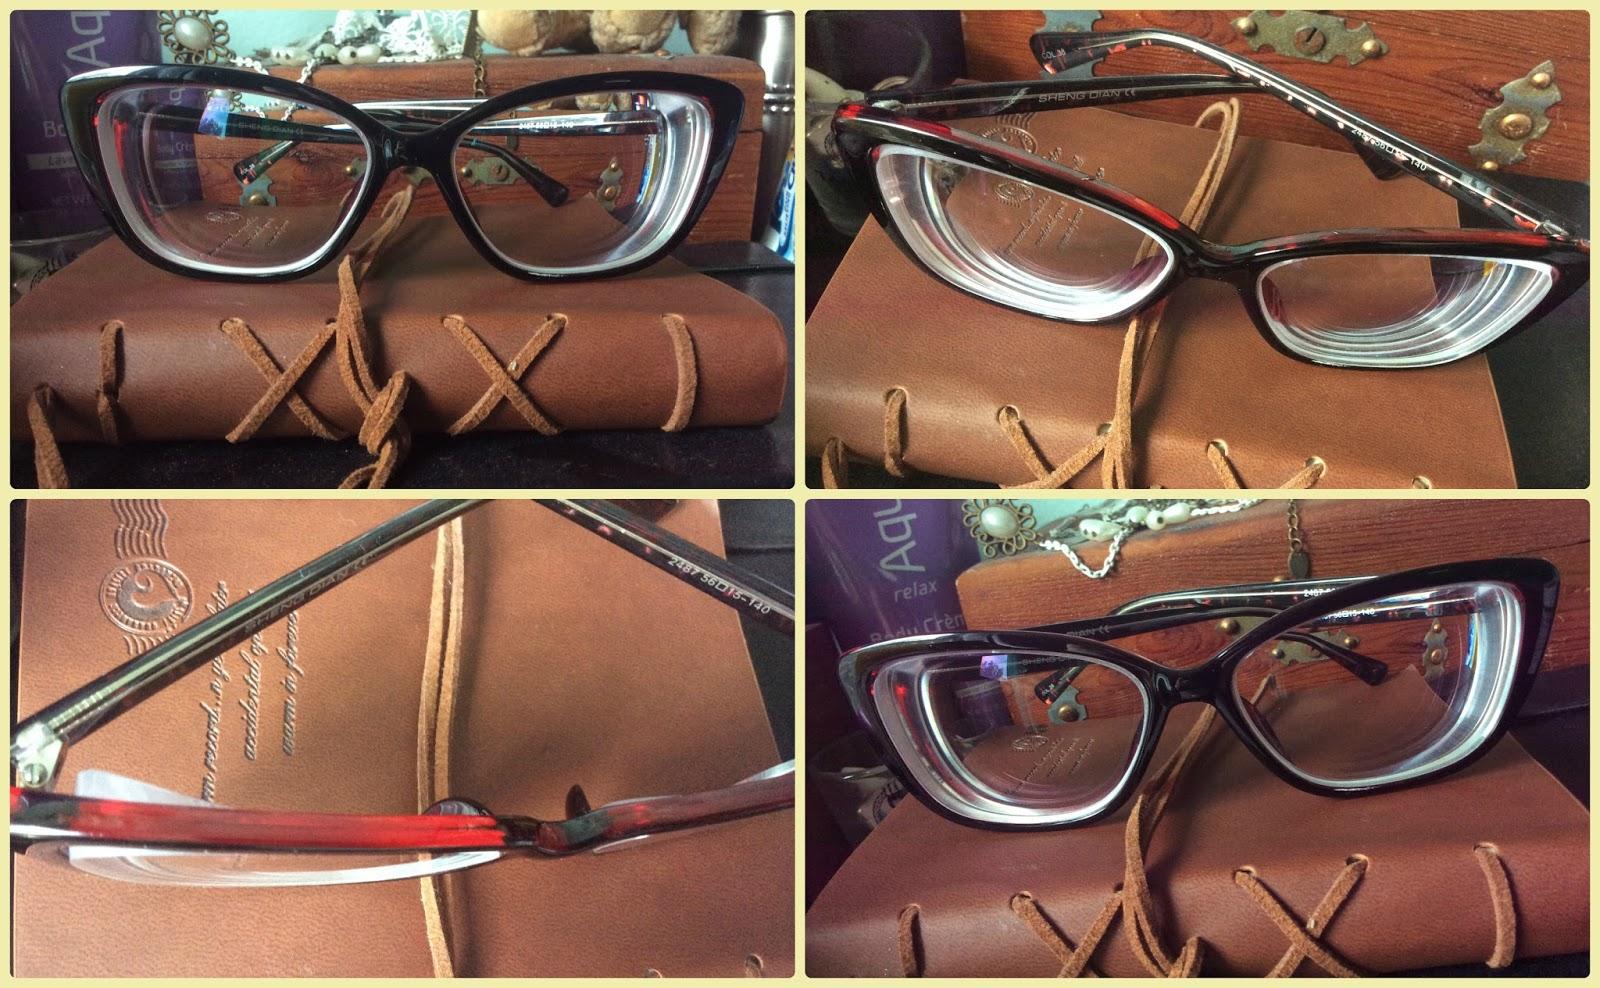 Nesca\'s Nook: My new Cat Eye Prescription Glasses from GlassesShop.com